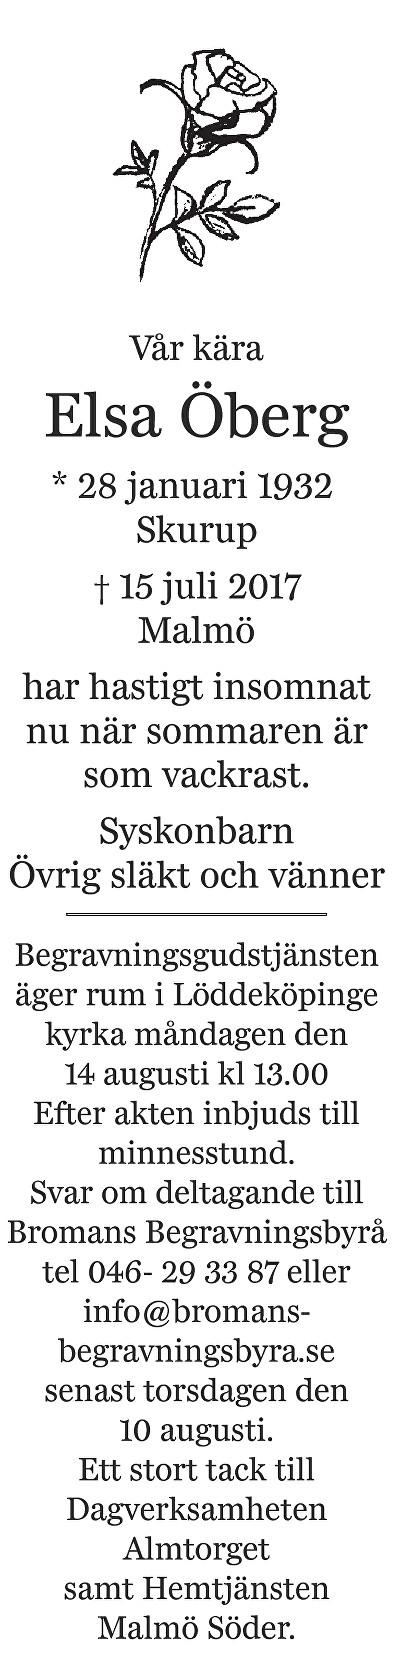 Elsa Öberg Death notice